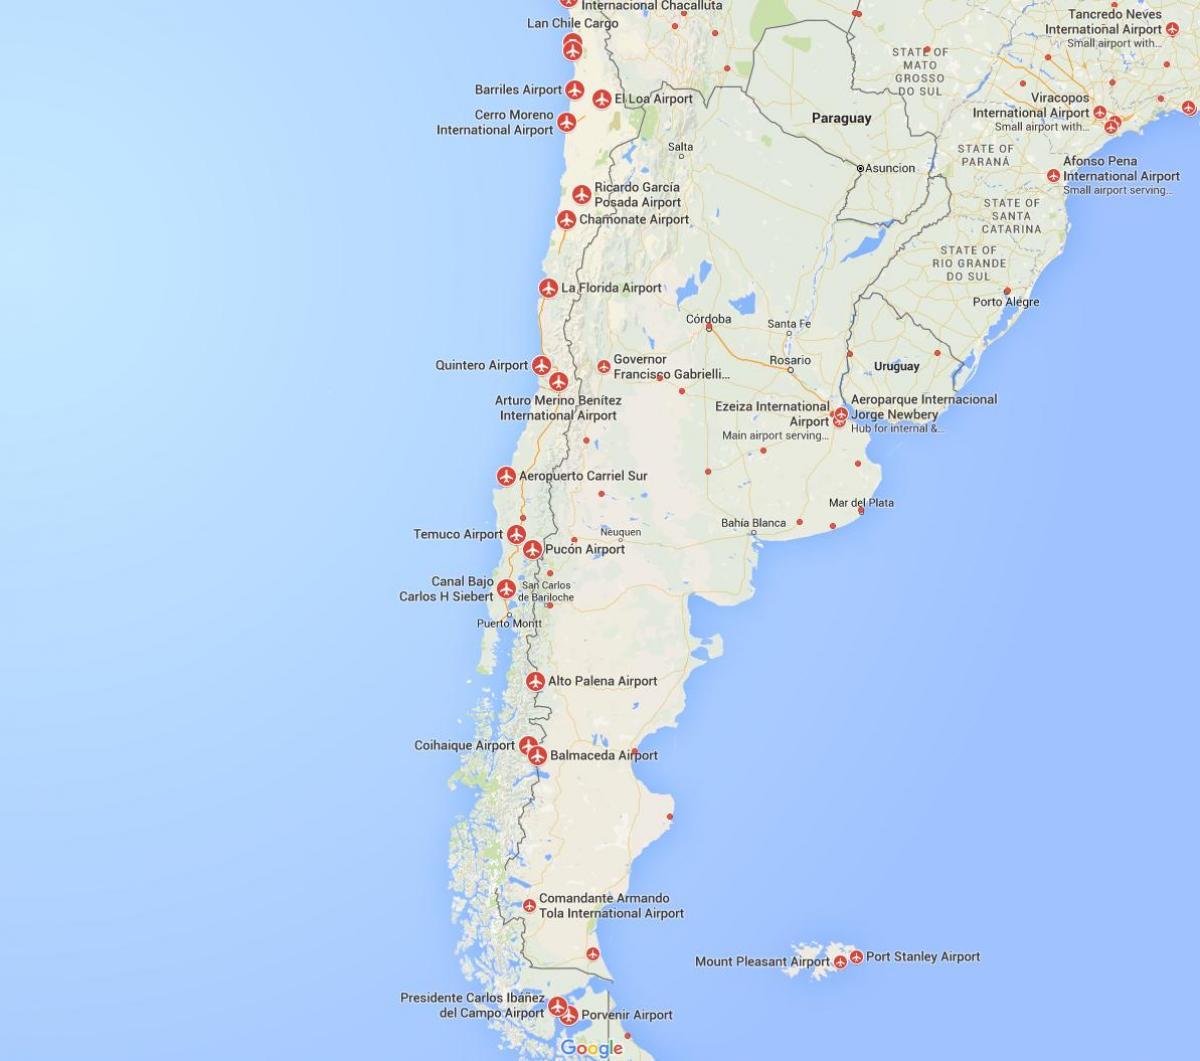 Carte Amerique Du Sud Aeroport.Chili Aeroports Carte Carte Des Aeroports De Chili